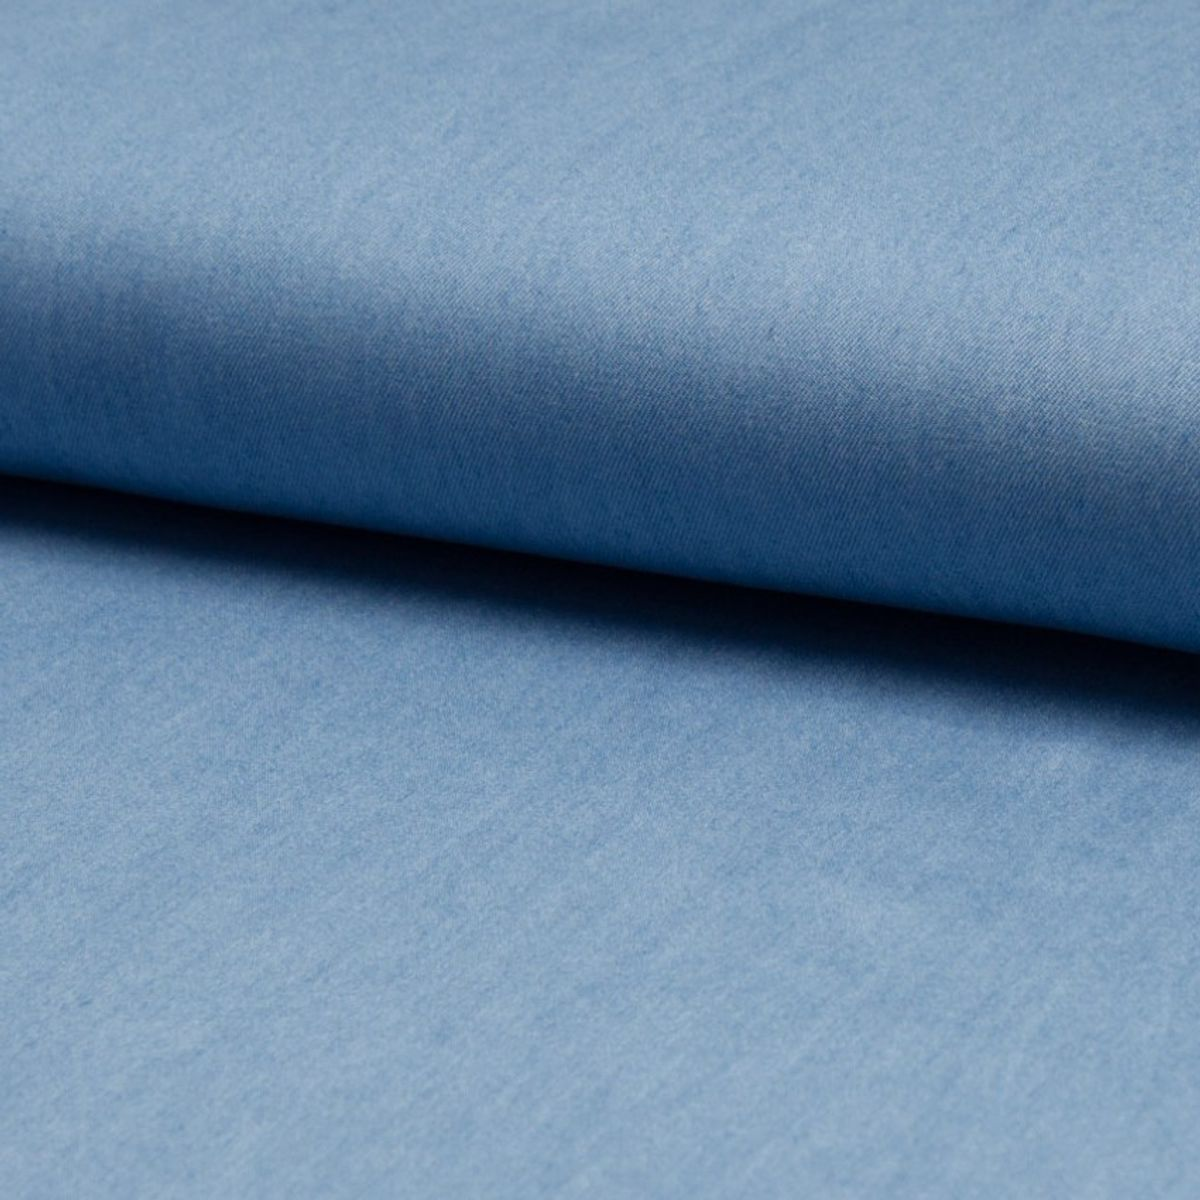 Tissu tencel chambray - Bleu ciel